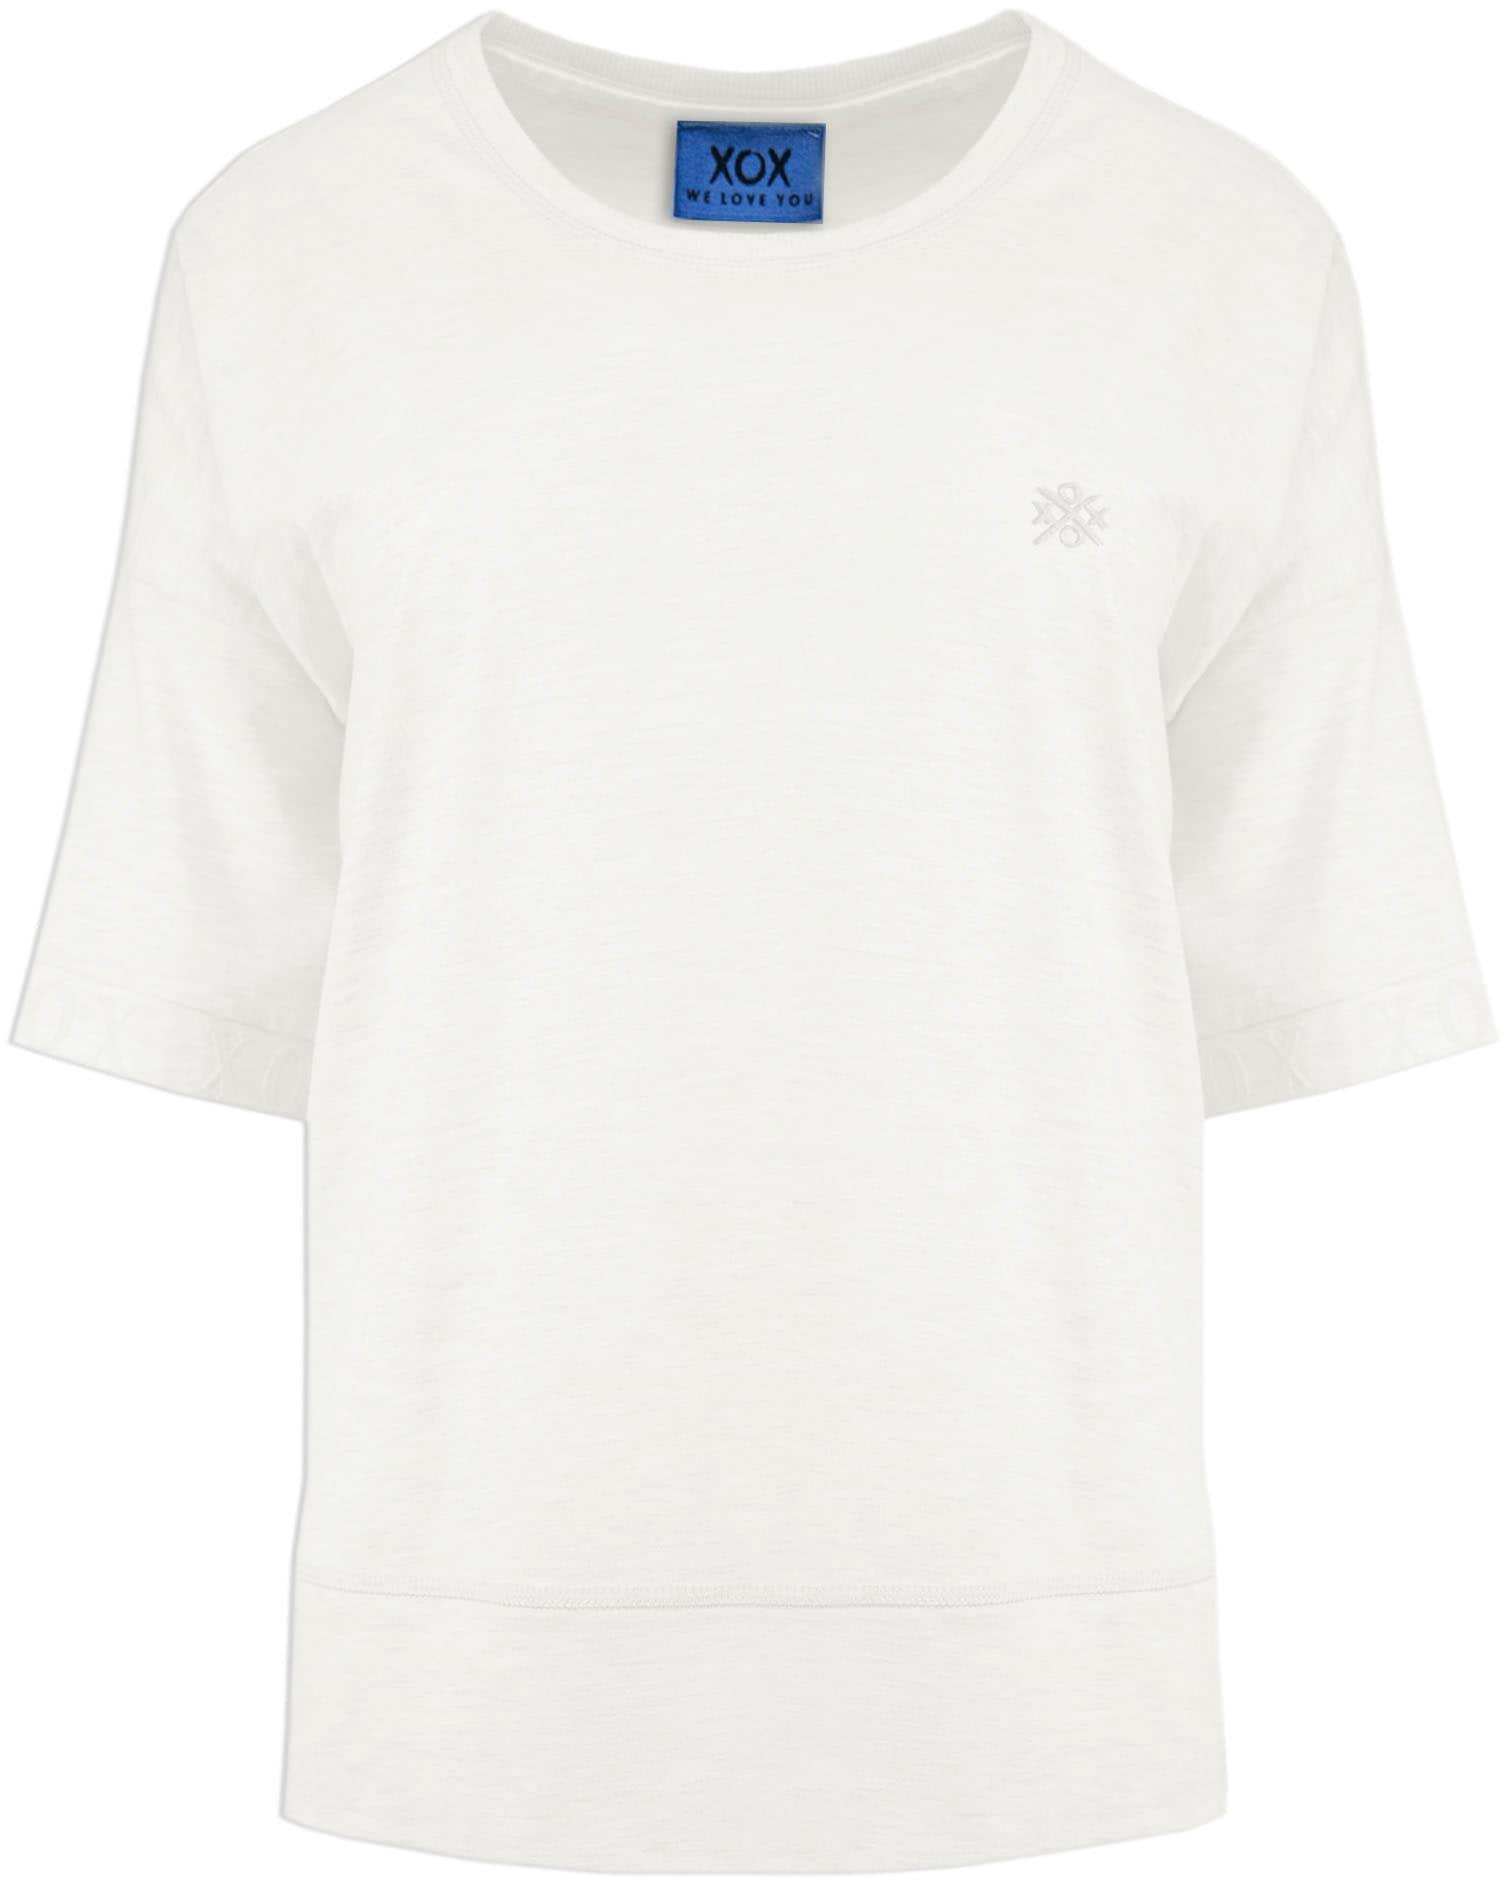 xox -  Oversize-Shirt, lässiges Shirt, 3/4 Ärmel mit Flockprint